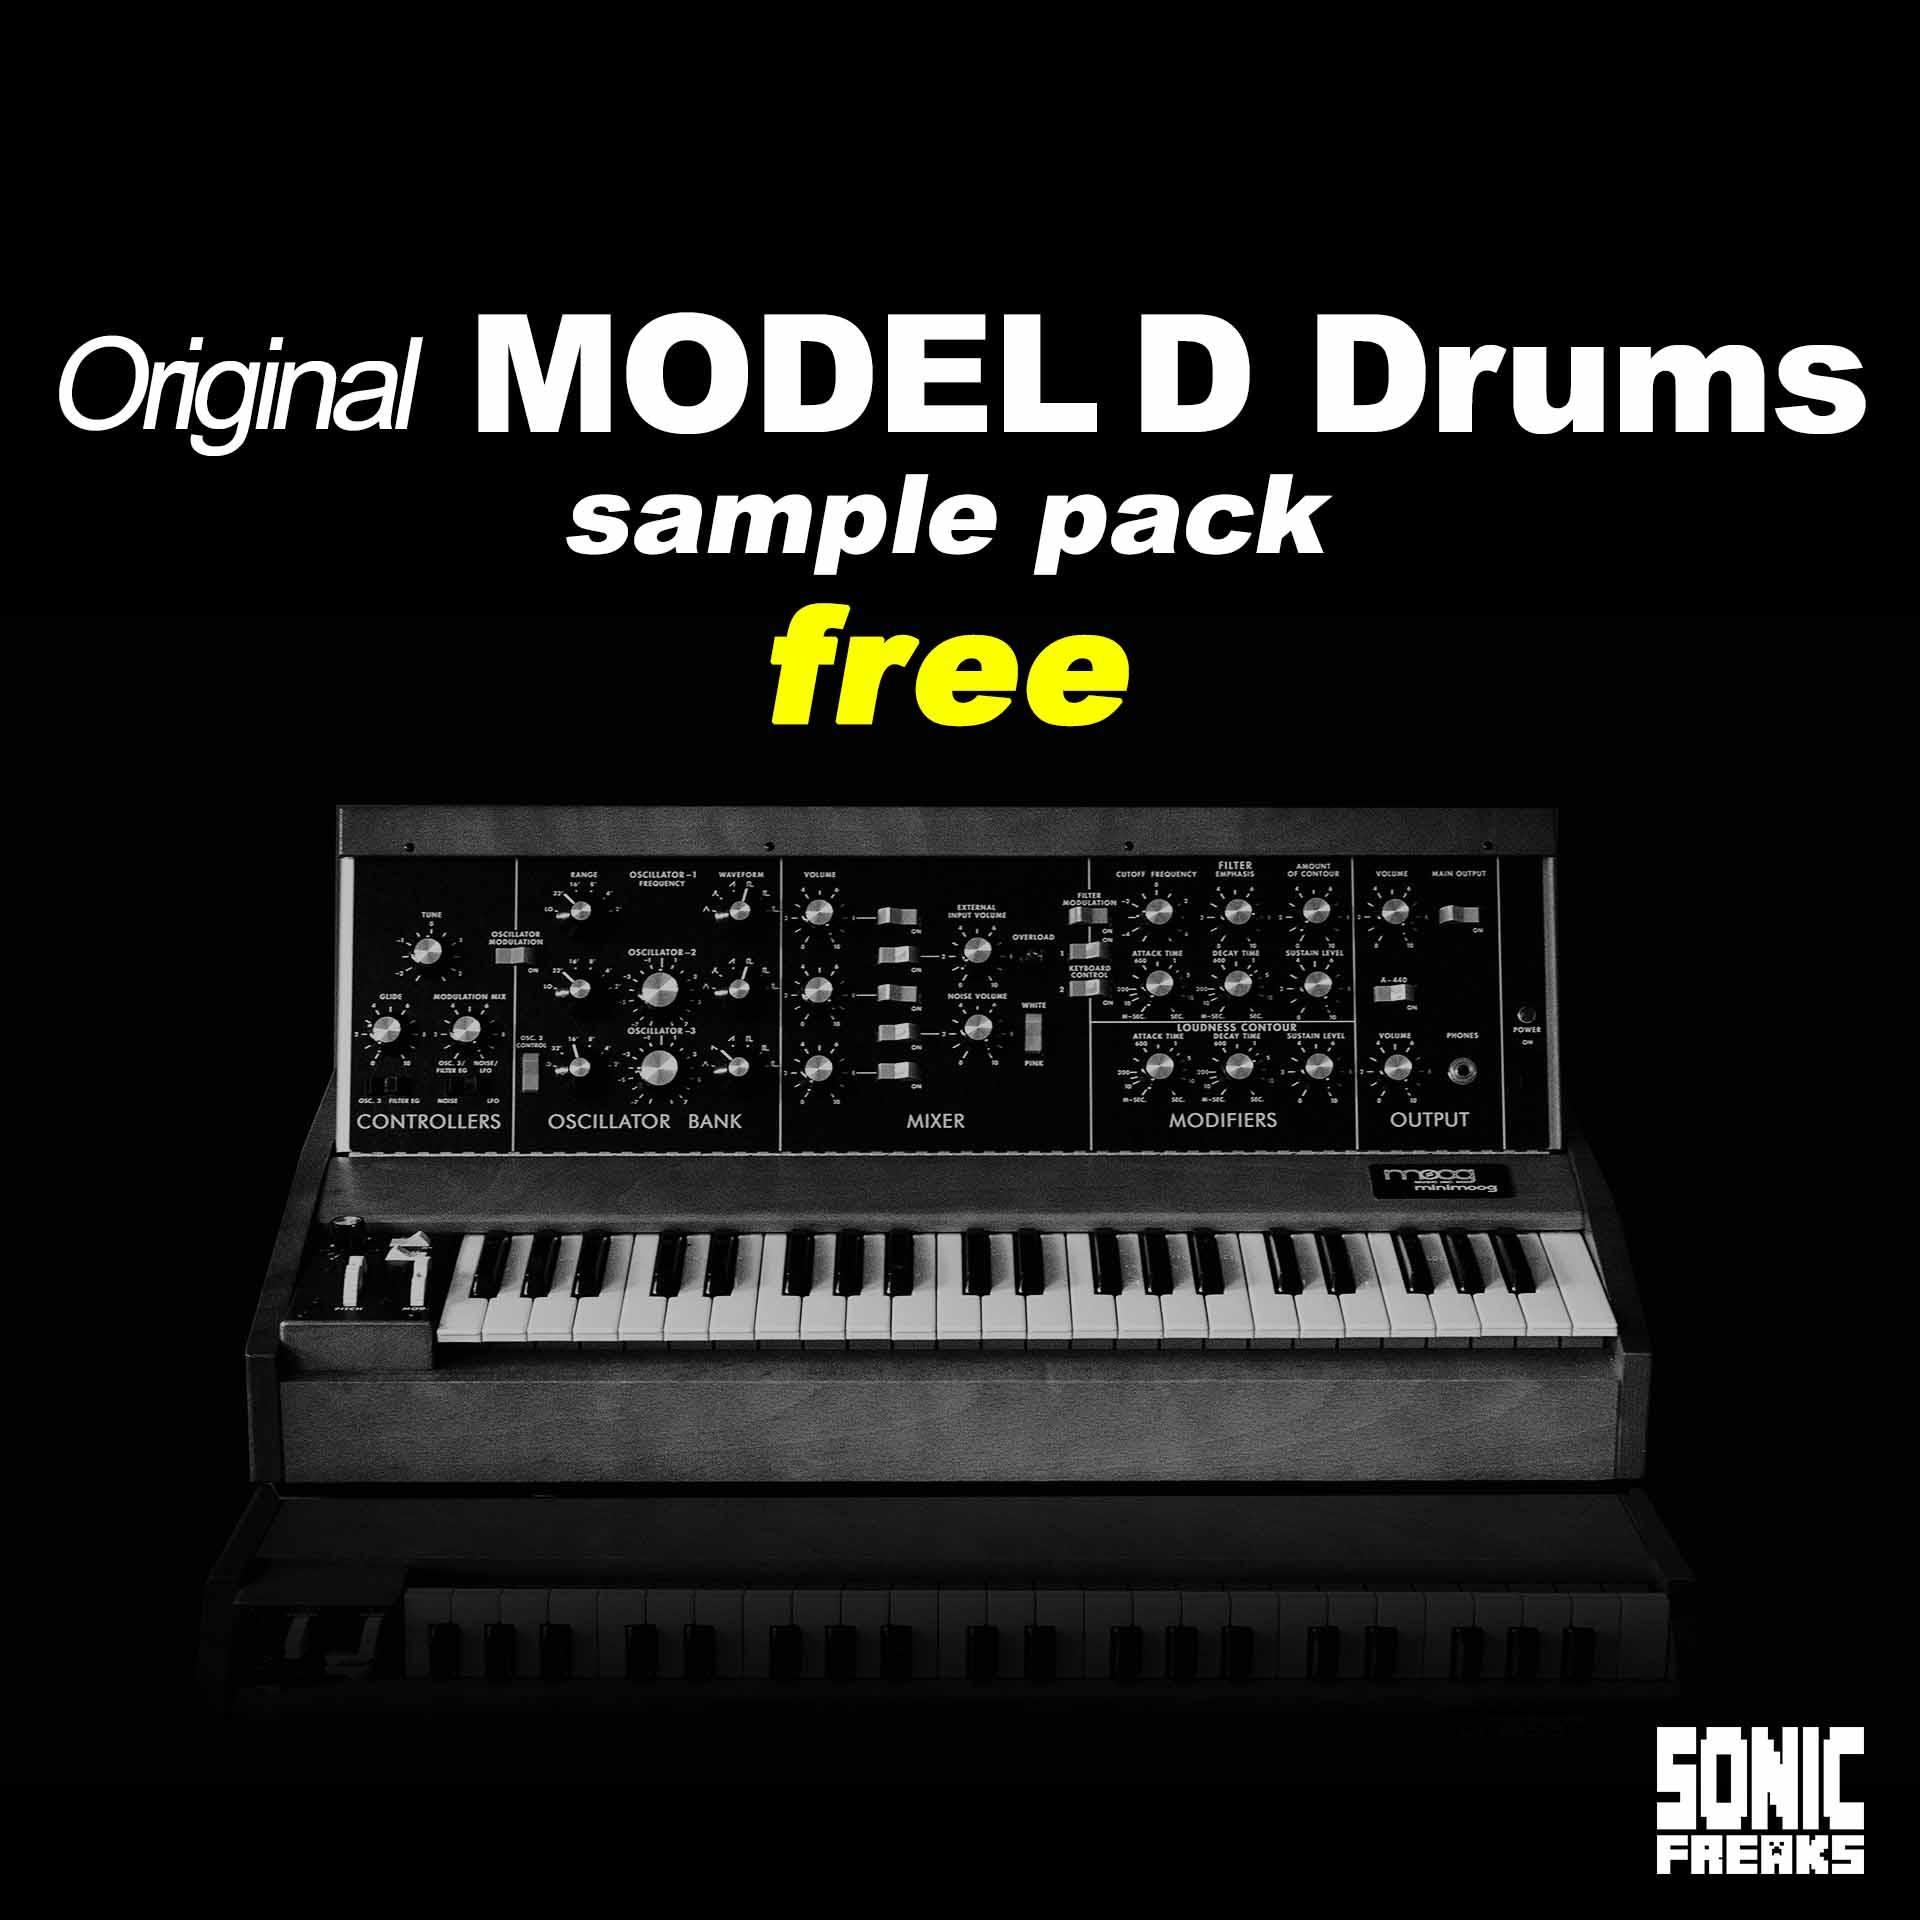 Original Model D Drums